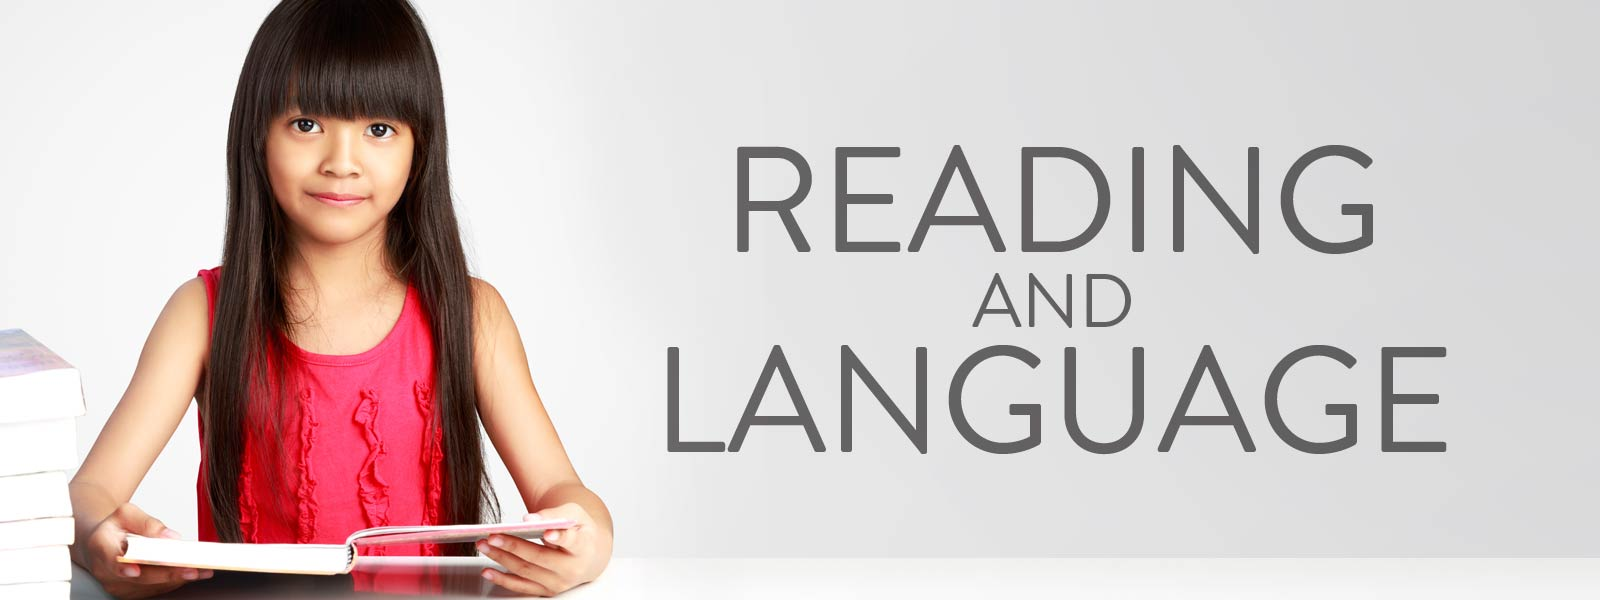 Reading and Language